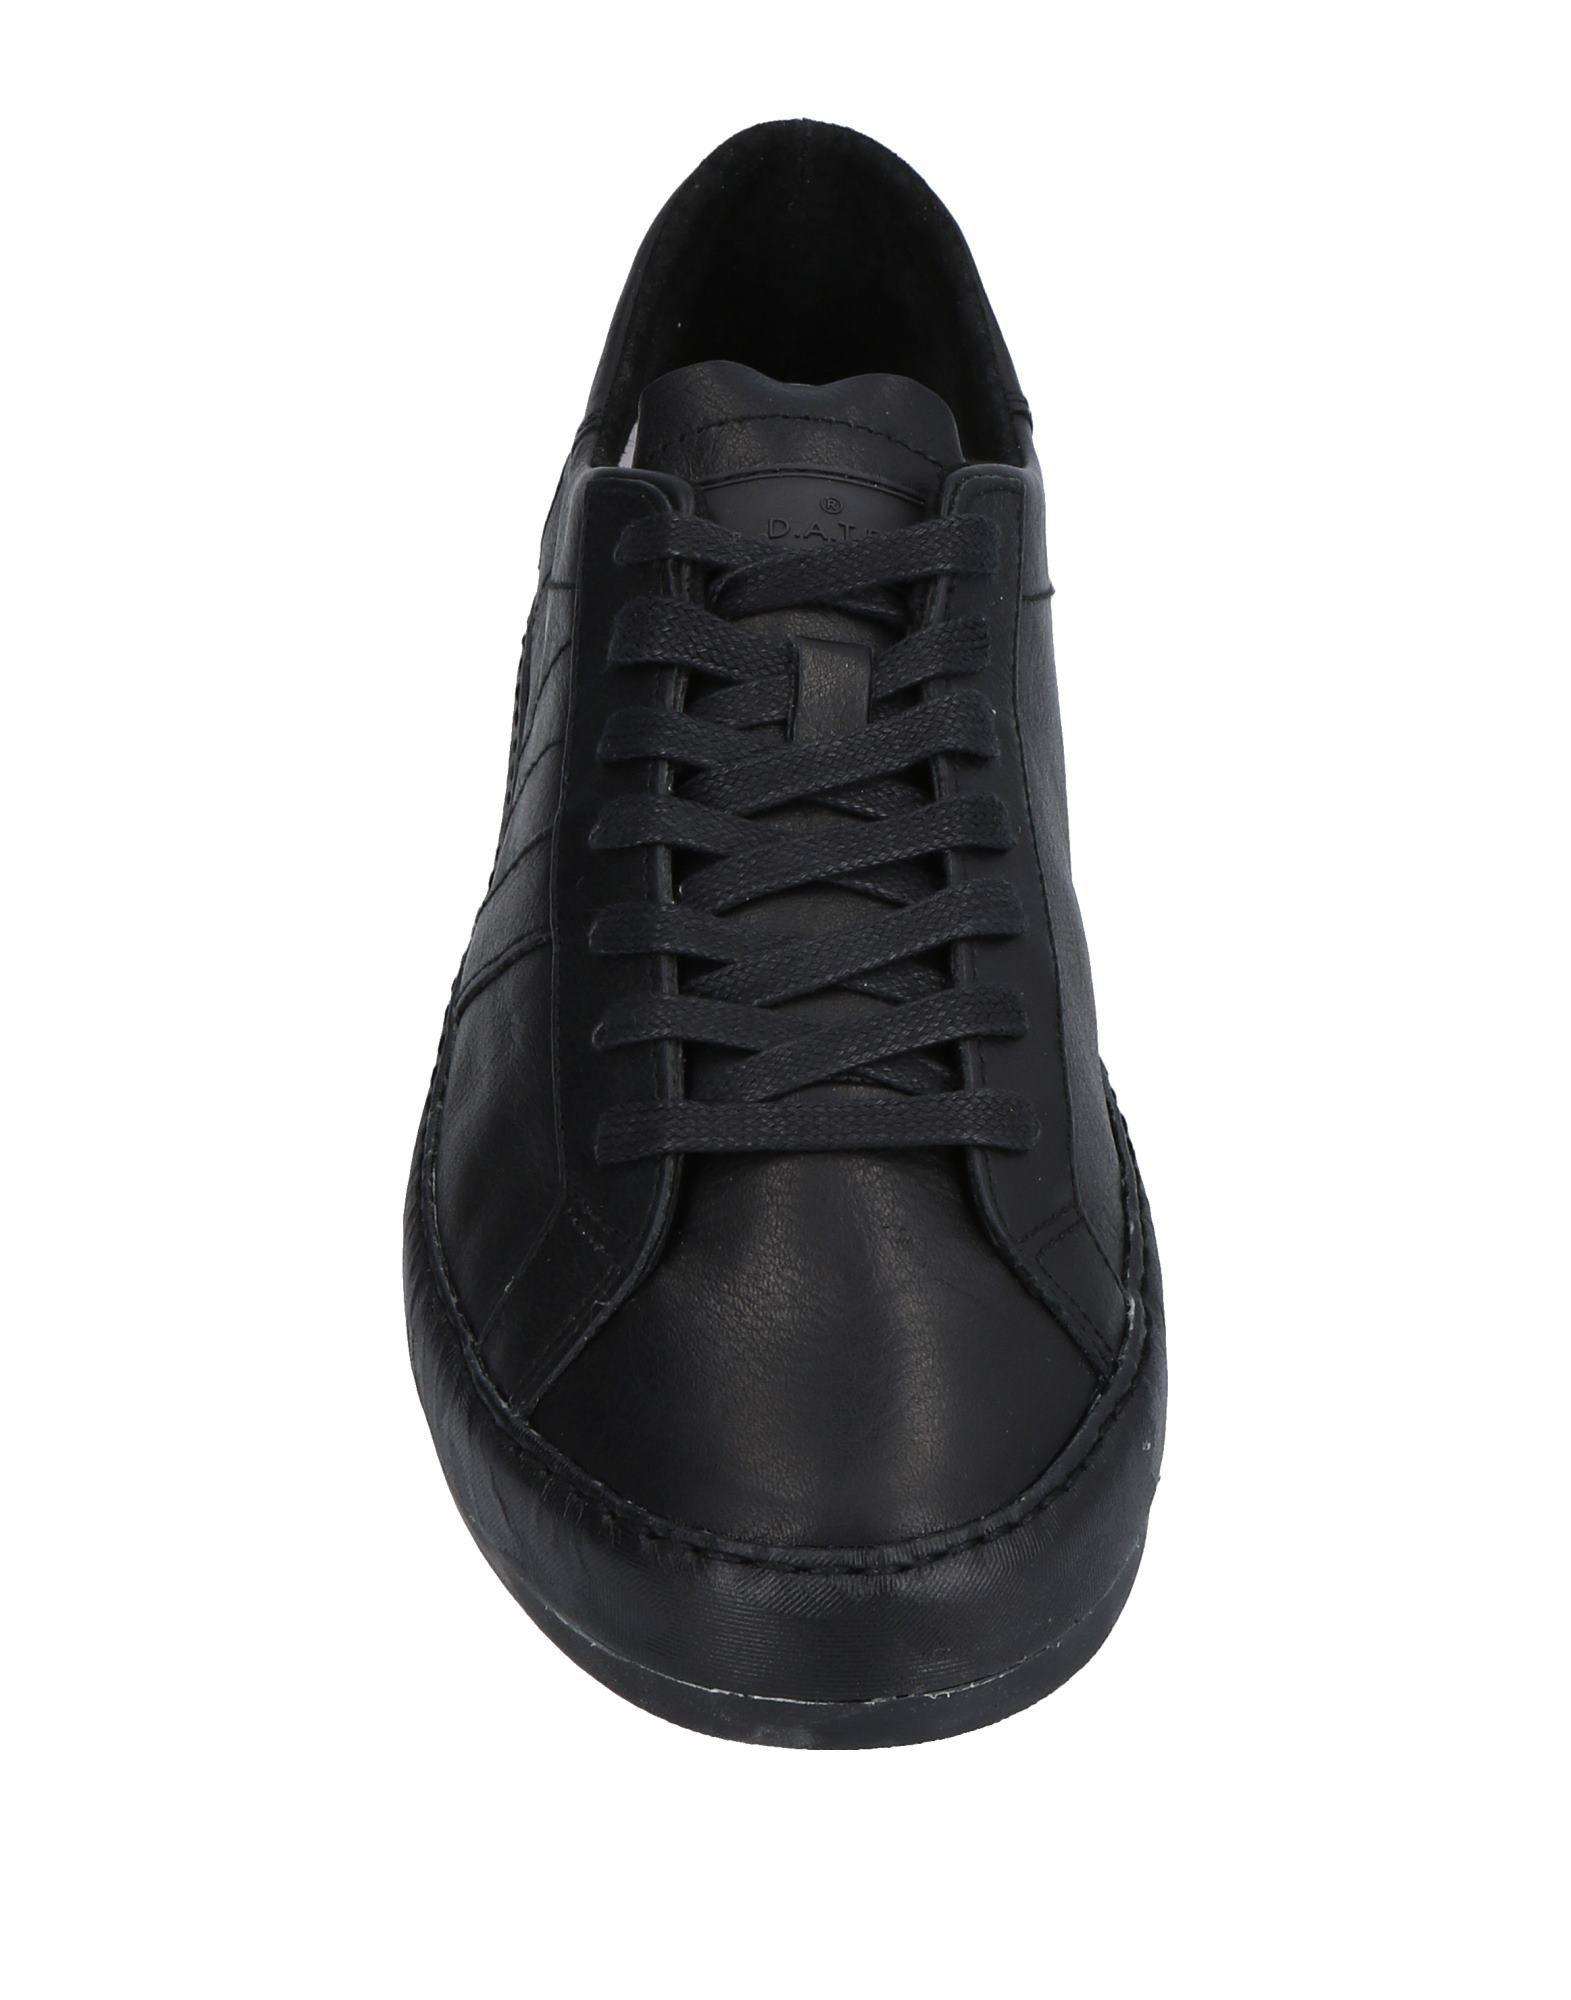 Rabatt Herren echte Schuhe D.A.T.E. Sneakers Herren Rabatt  11510693WW 49e24d